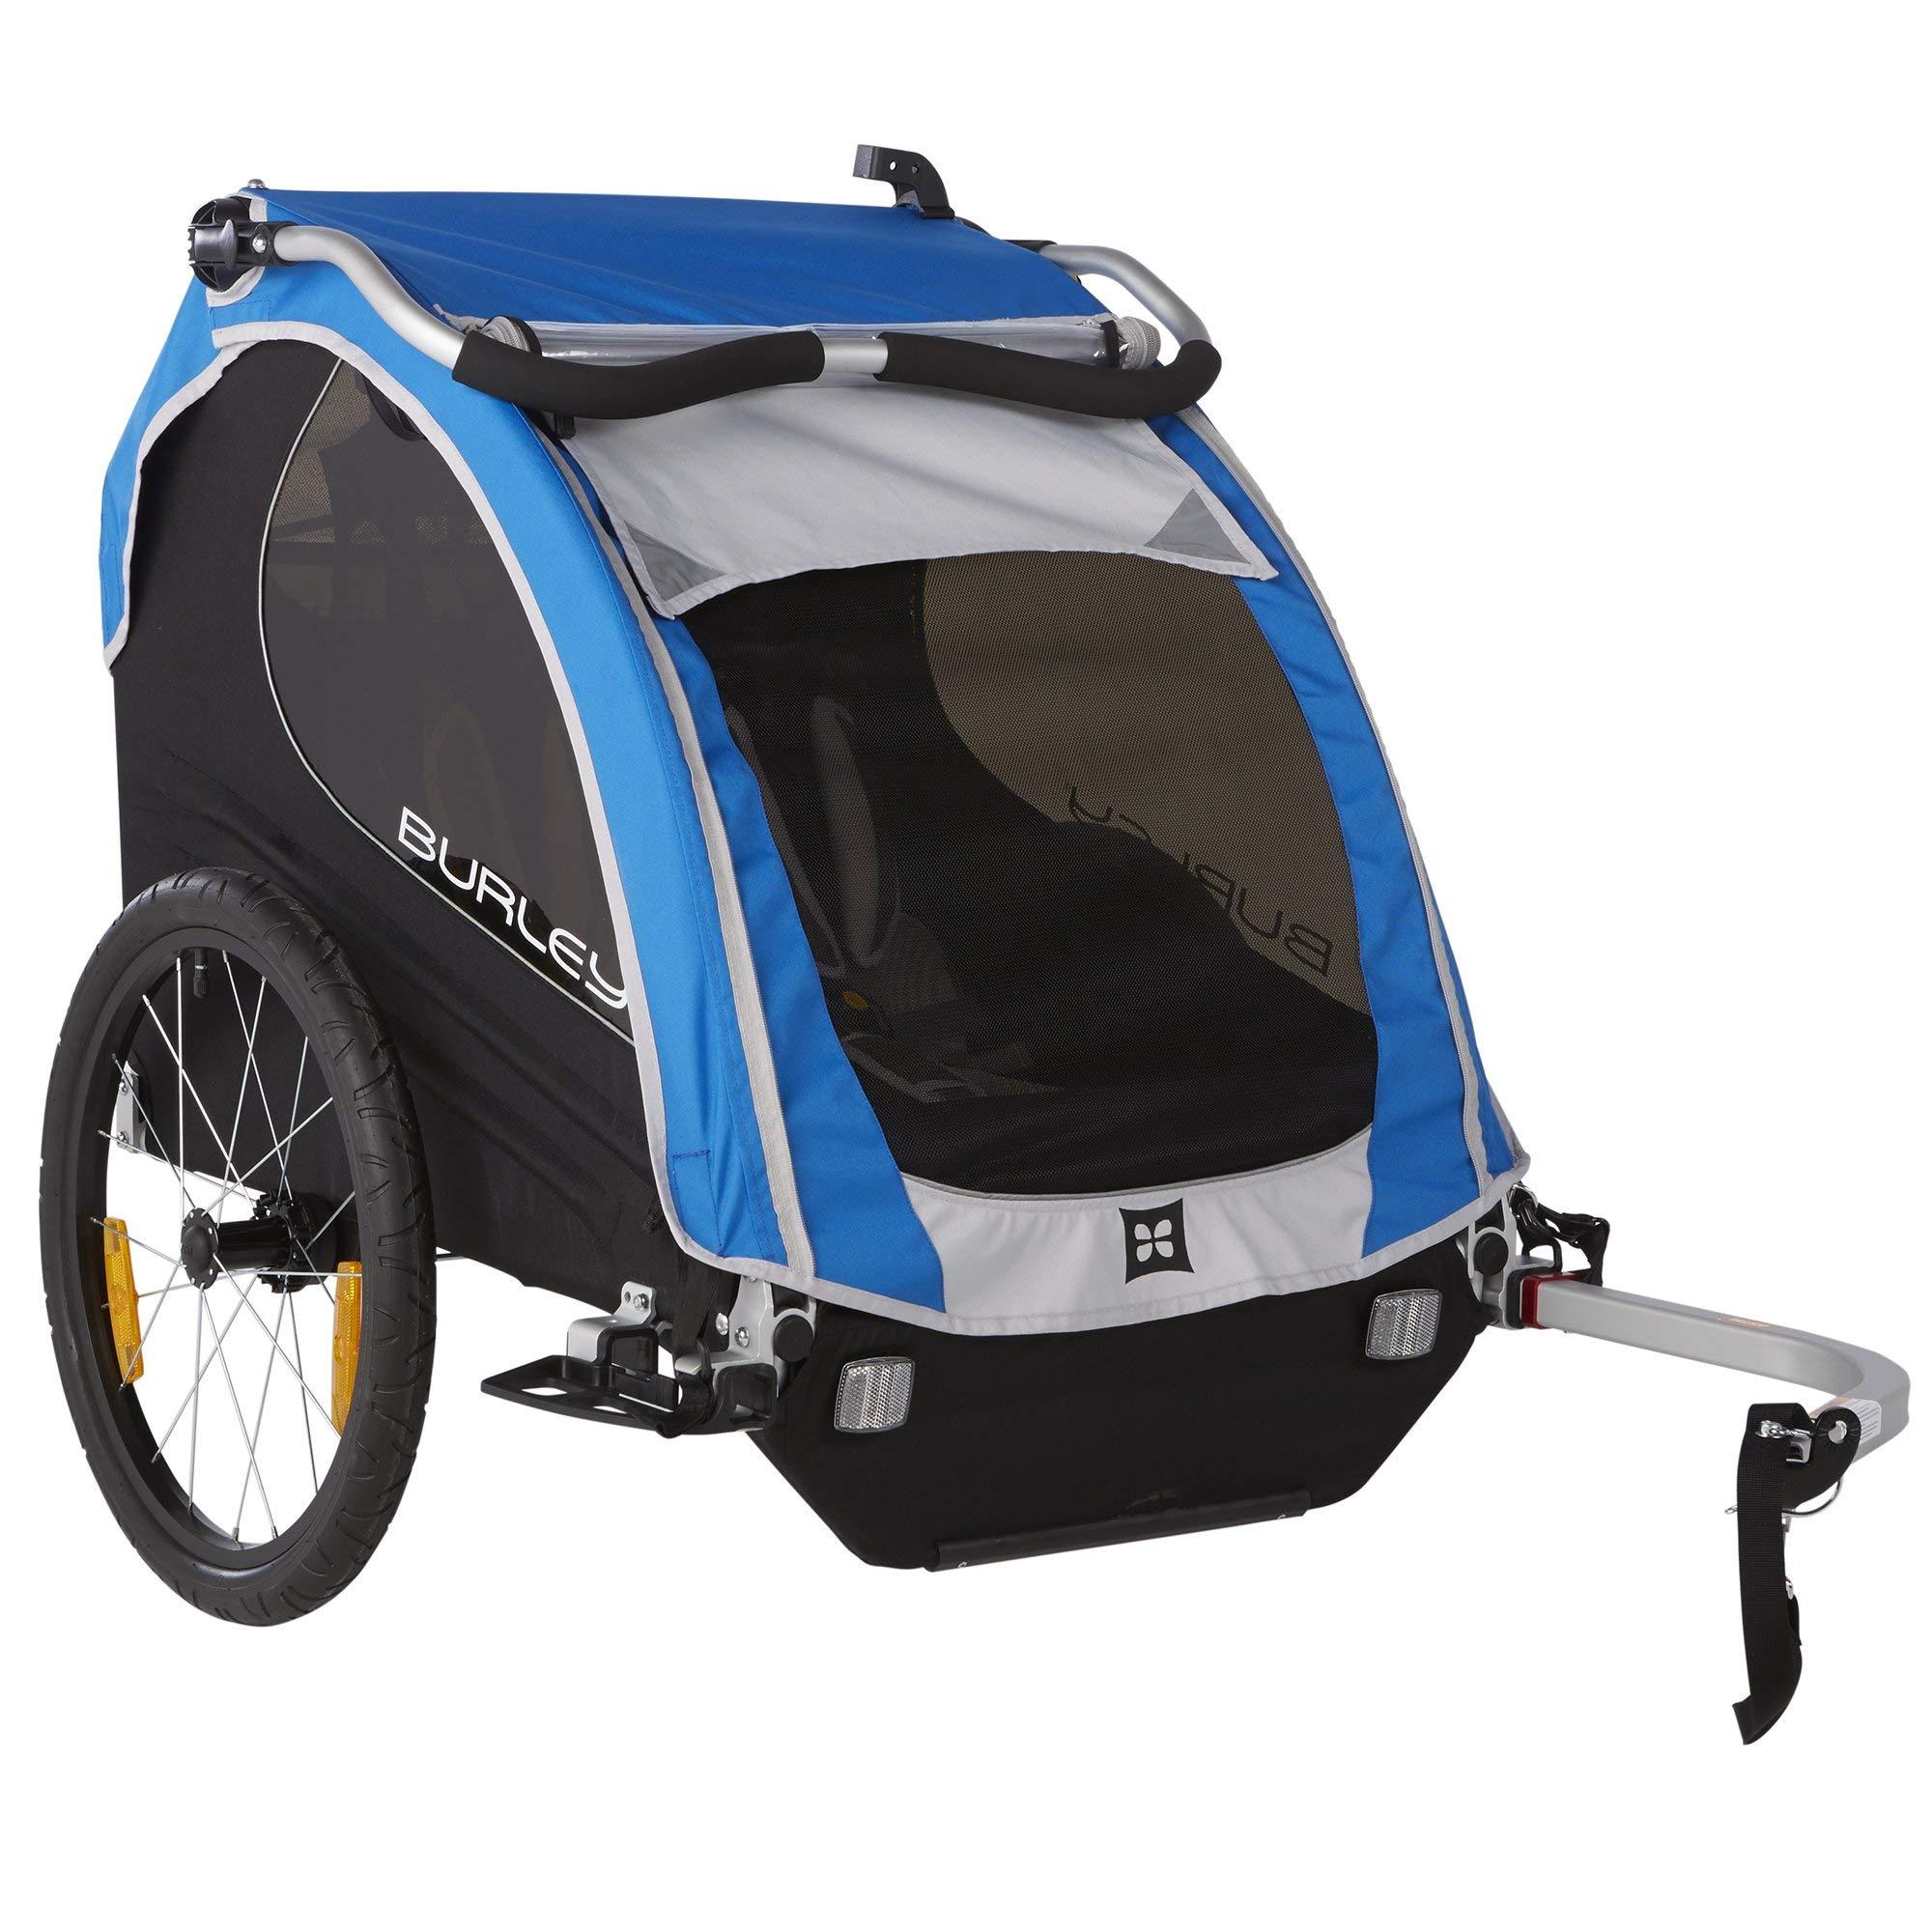 Burley Design Encore Child Bike Trailer, Blue (Renewed)